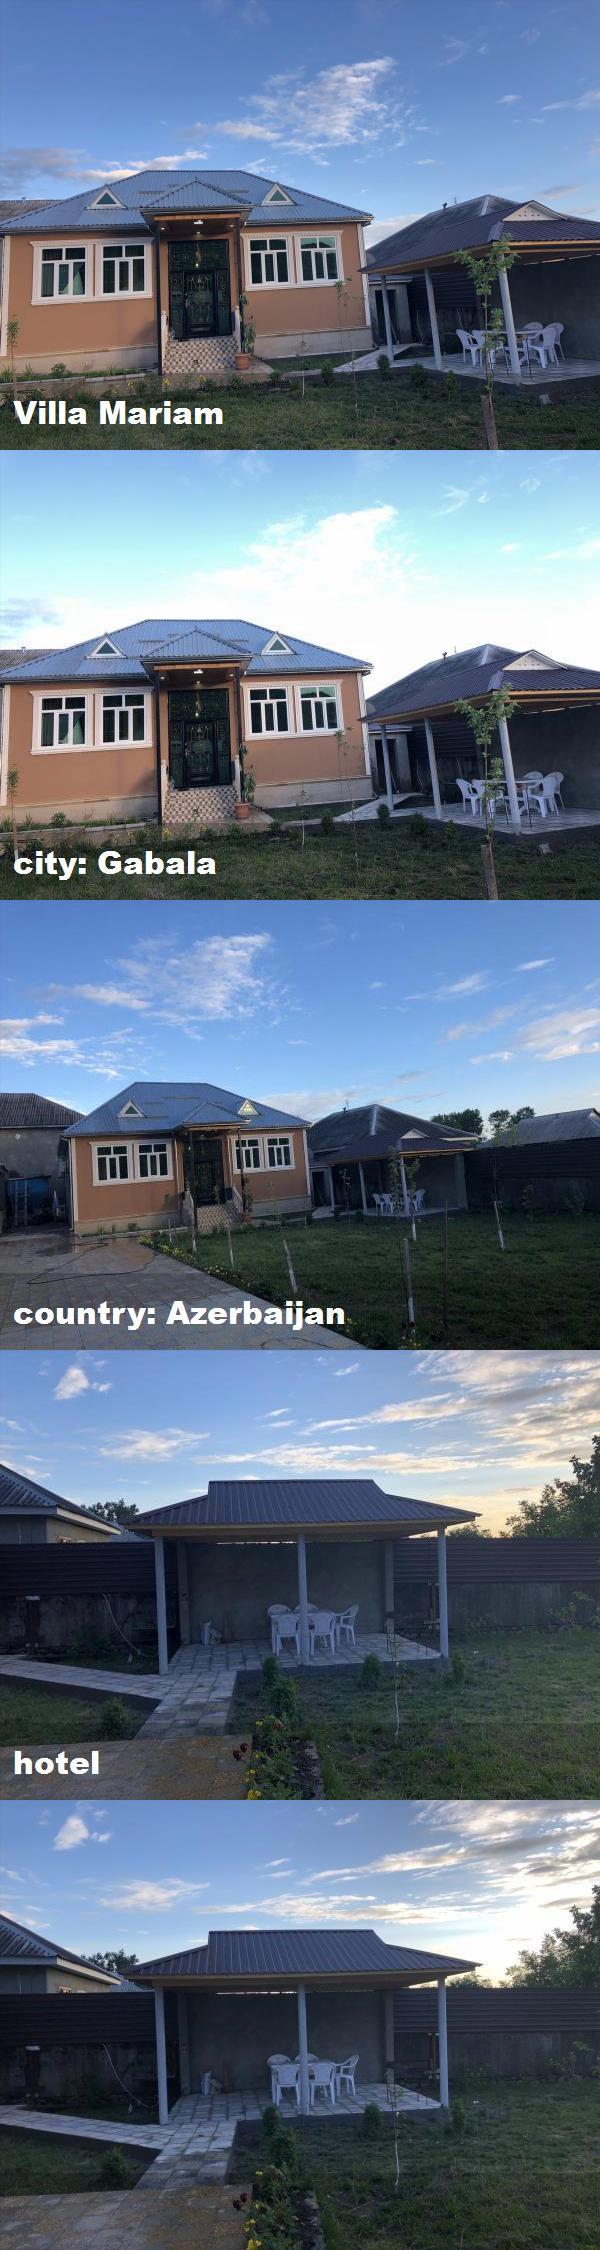 Villa Mariam City Gabala Country Azerbaijan Hotel Villa Hotel Mansions